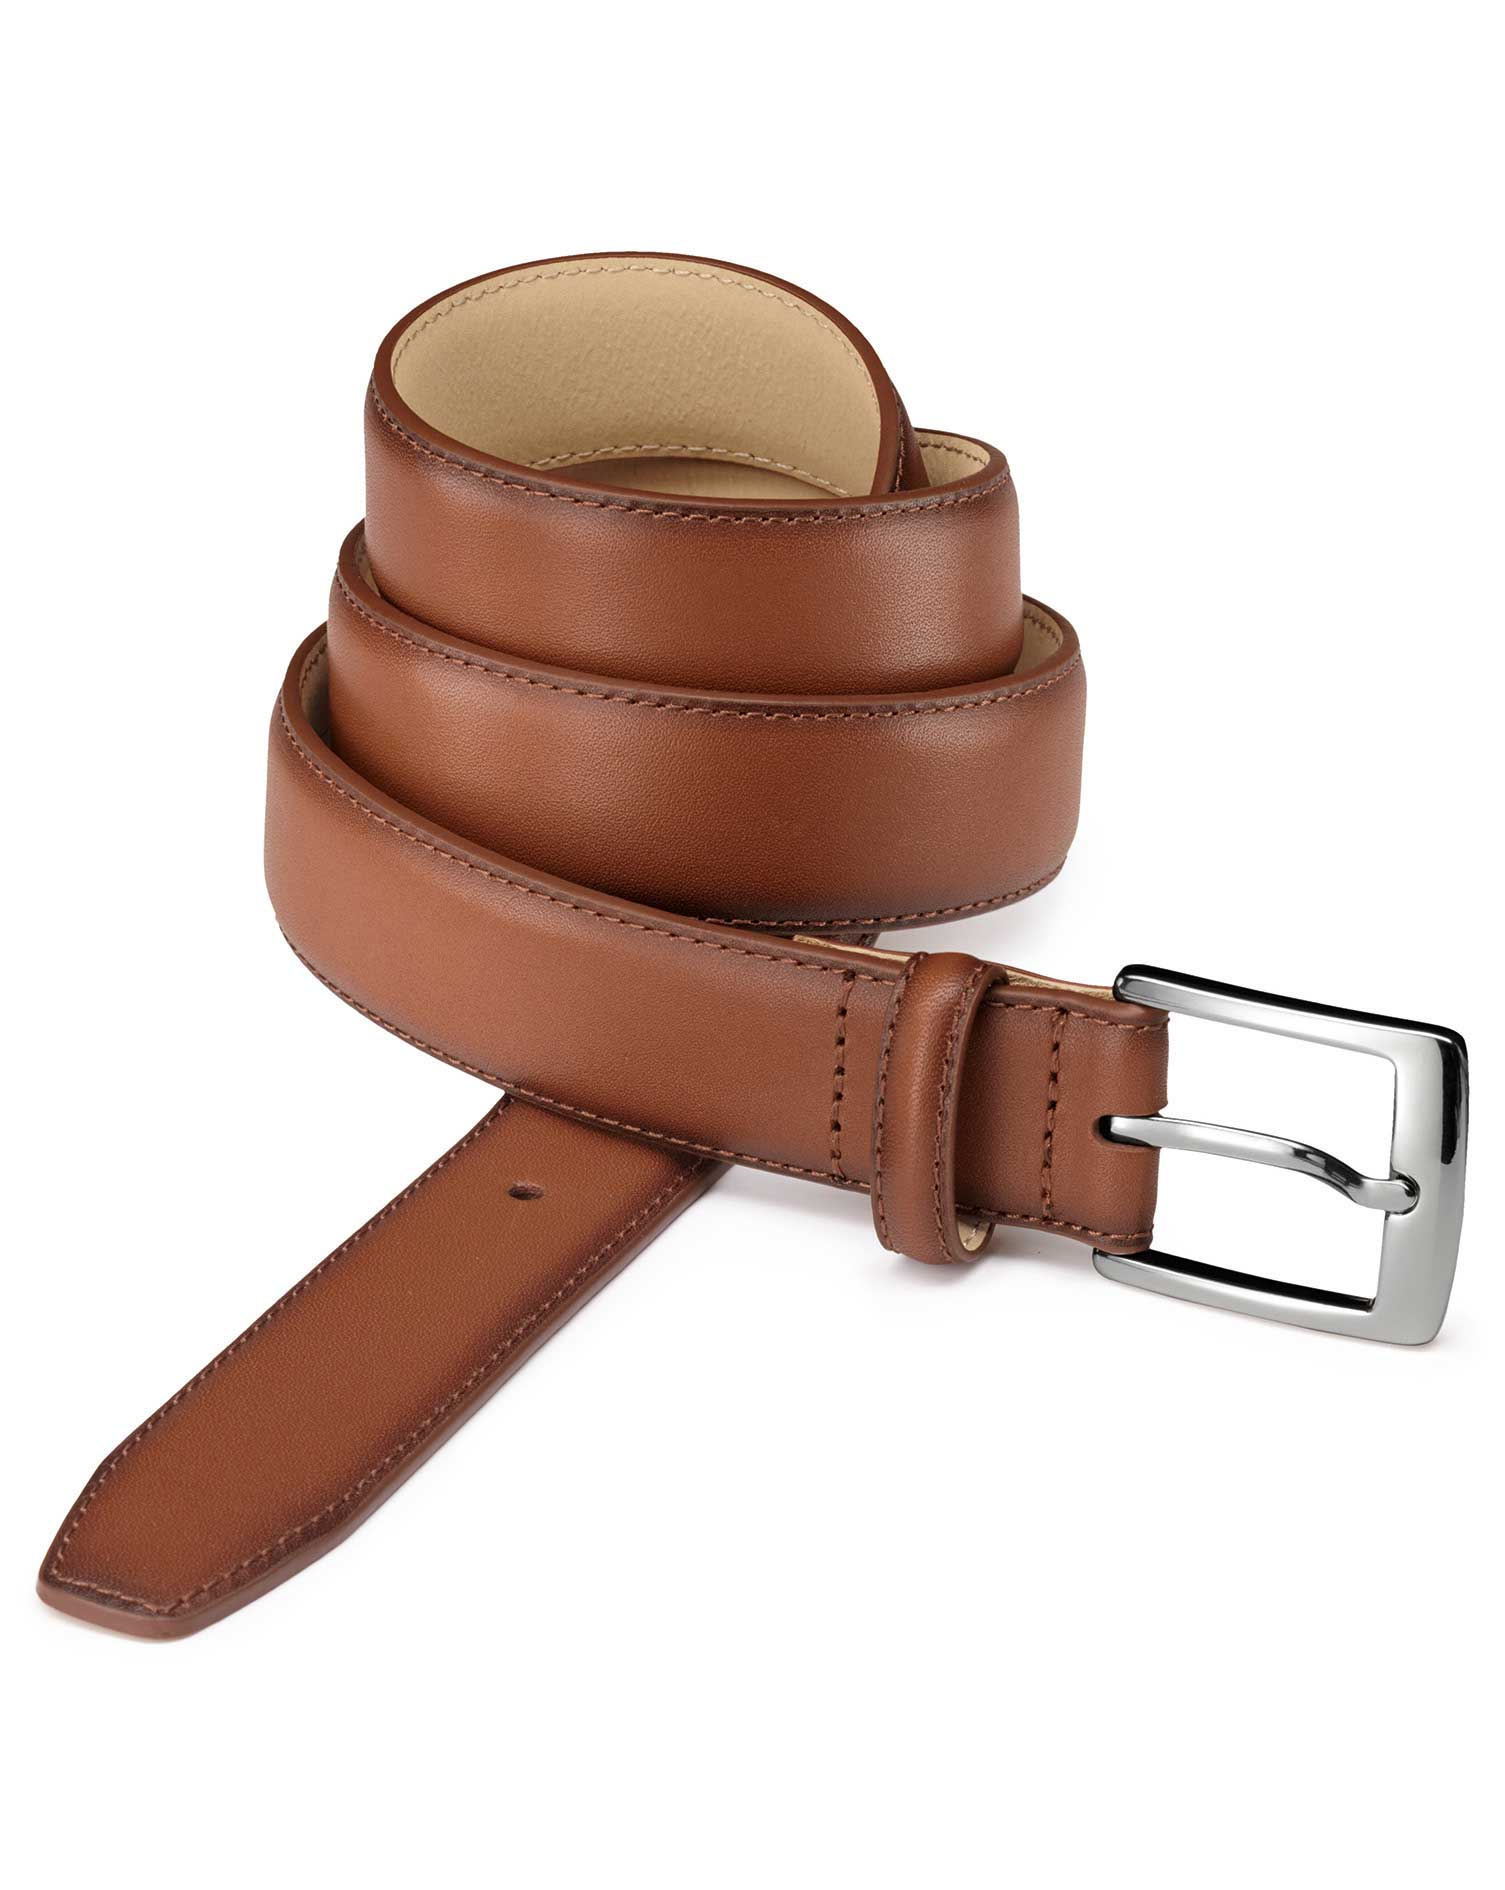 Dark Tan Leather Formal Belt Size 38-40 by Charles Tyrwhitt